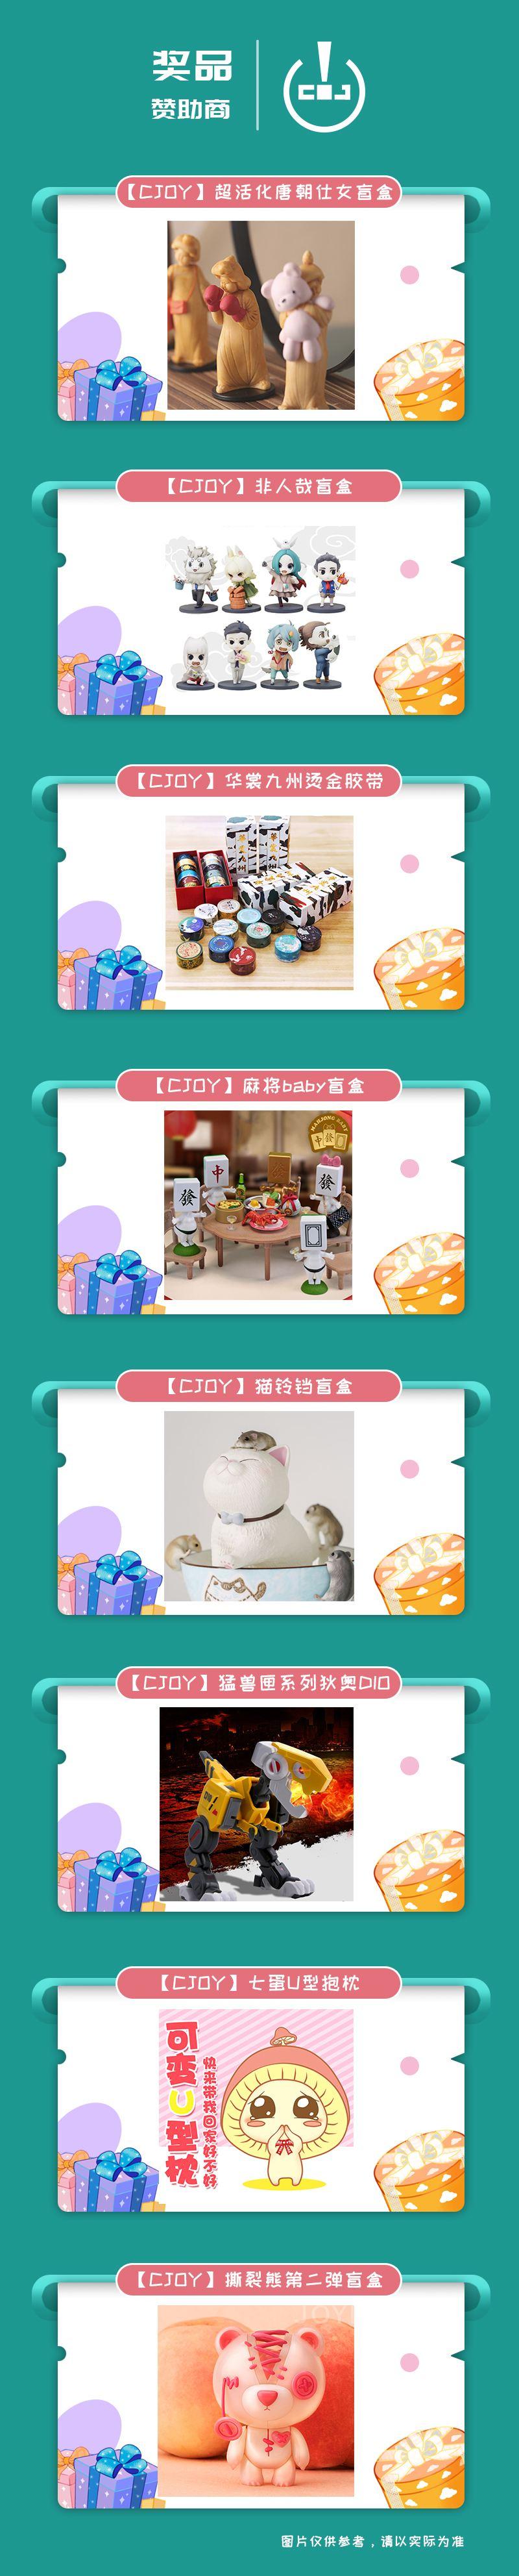 2019 ChinaJoy封面大赛第五周新人奖揭晓